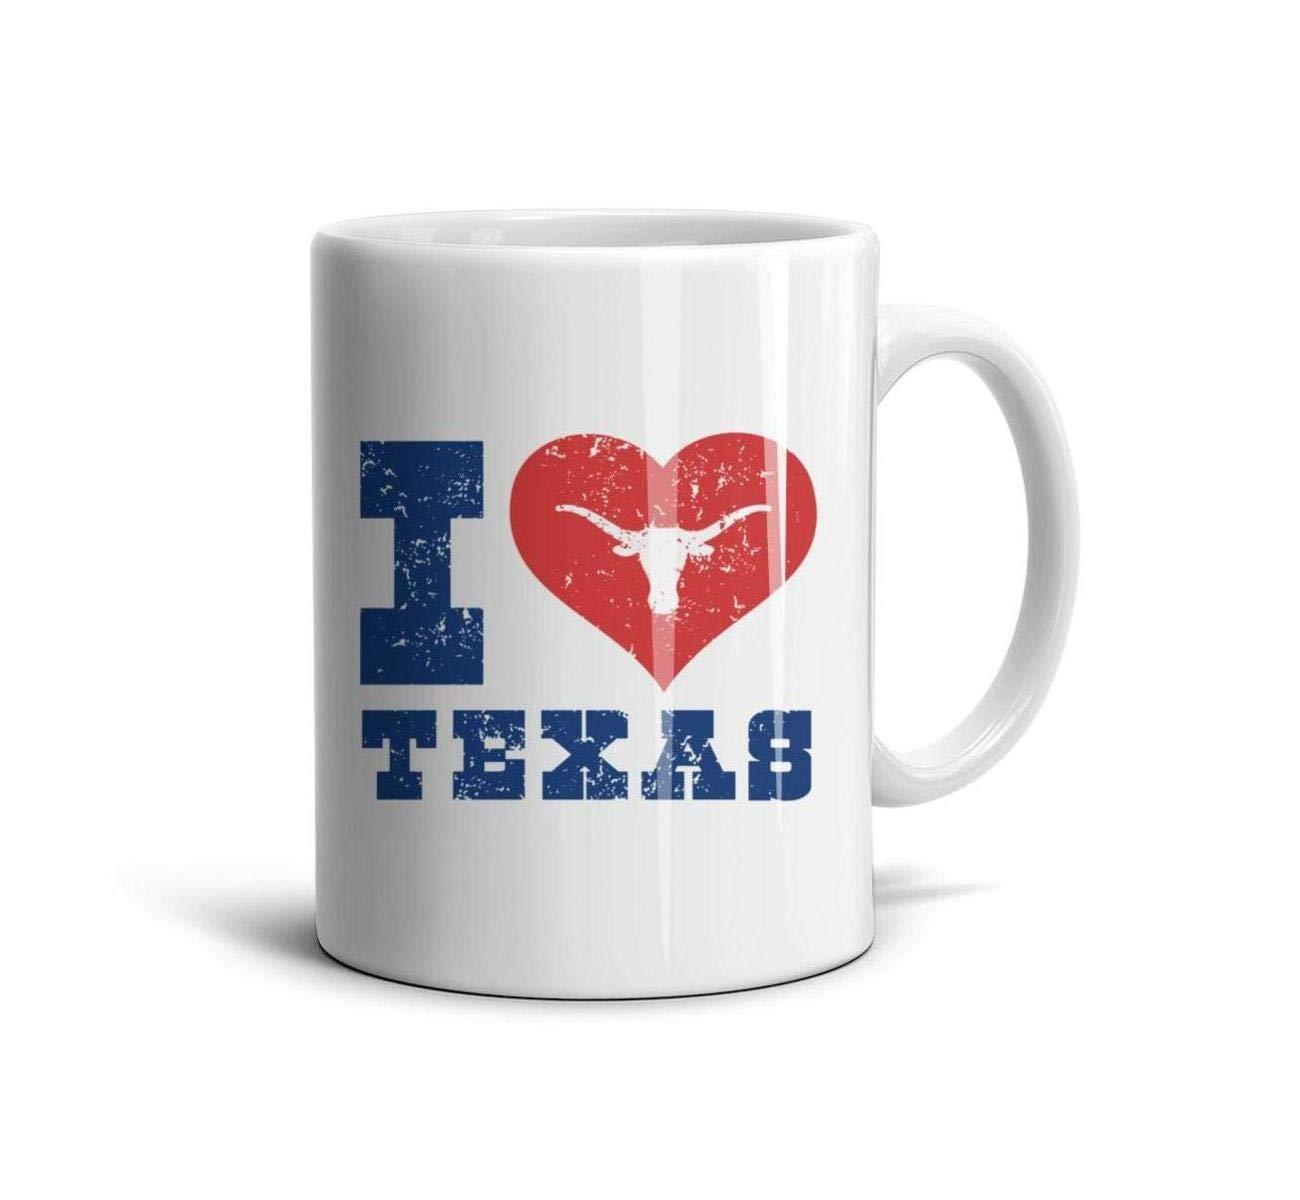 Shirtjkdsaa Funny Coffee Mug I Love Texas Longhorn Design Art - I Love Texas Fashion White Ceramic Daily Use Reusable Espresso Cup